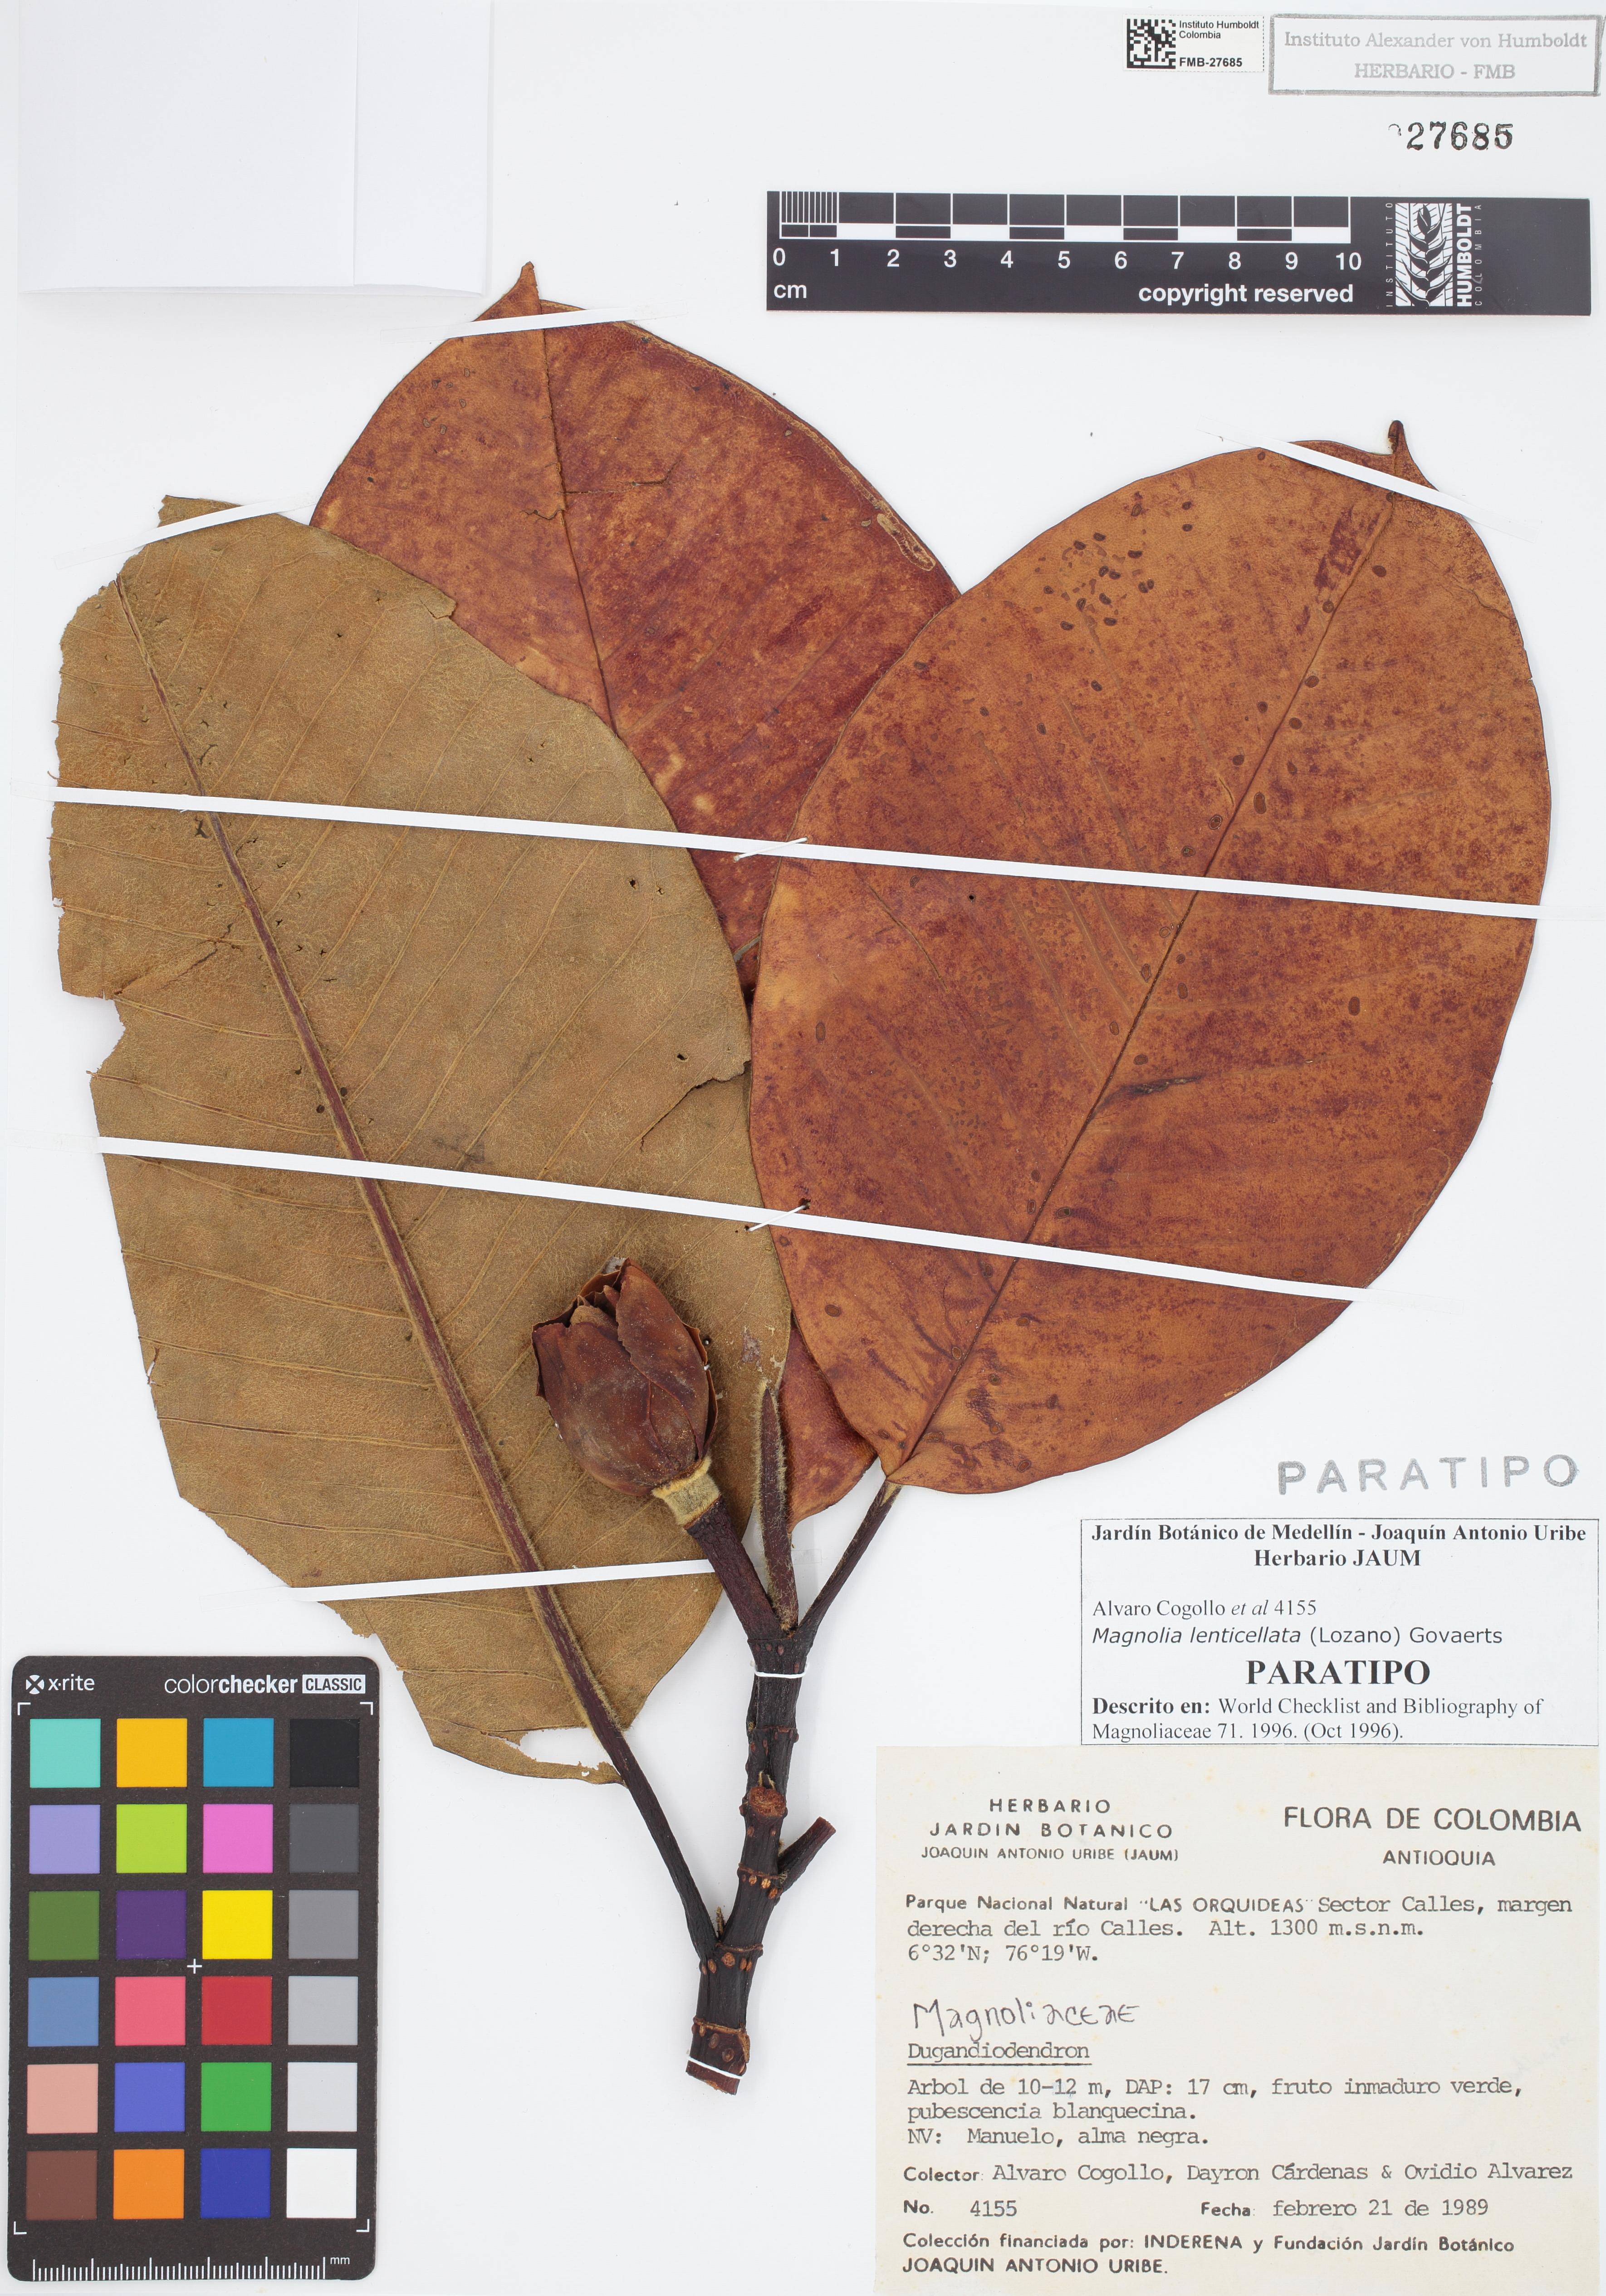 Paratipo de <em>Dugandiodendron lenticellatum</em>, FMB-27685, Fotografía por Robles A.